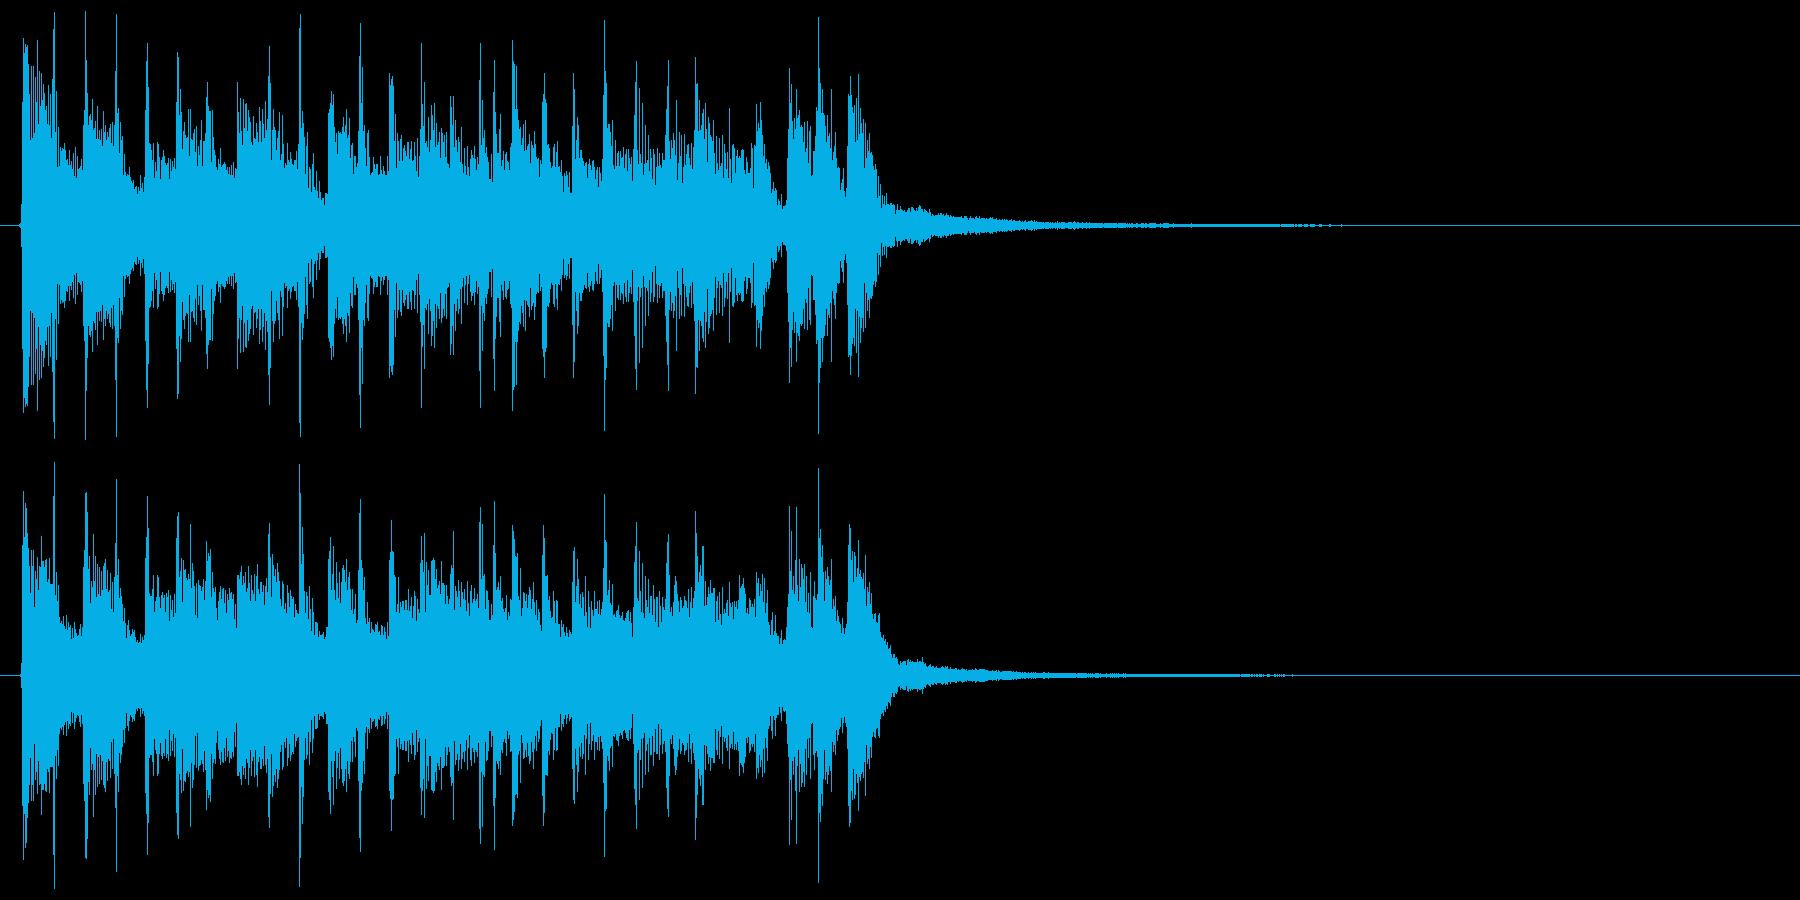 【JG】オープニングにあうジングル01の再生済みの波形